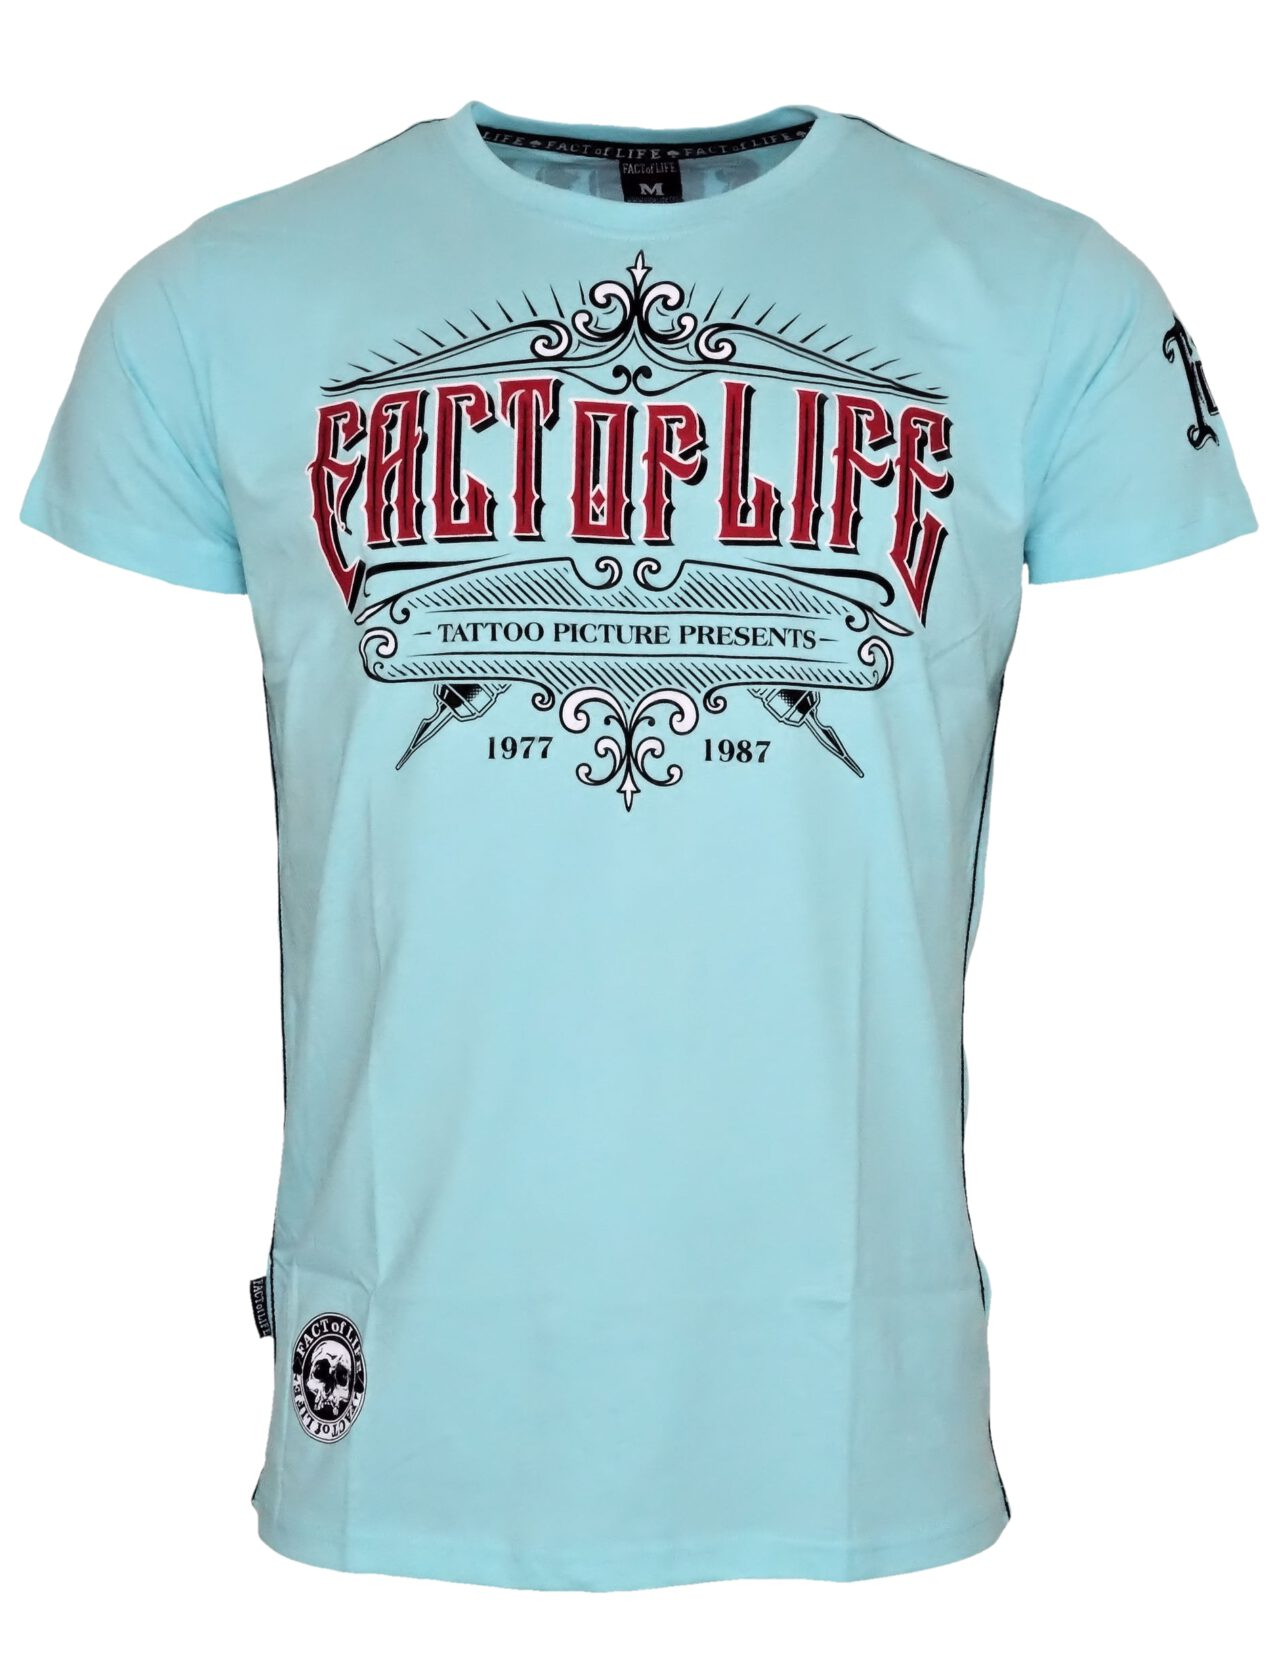 Fact of Life T-Shirt TS-31 Pik-Ass